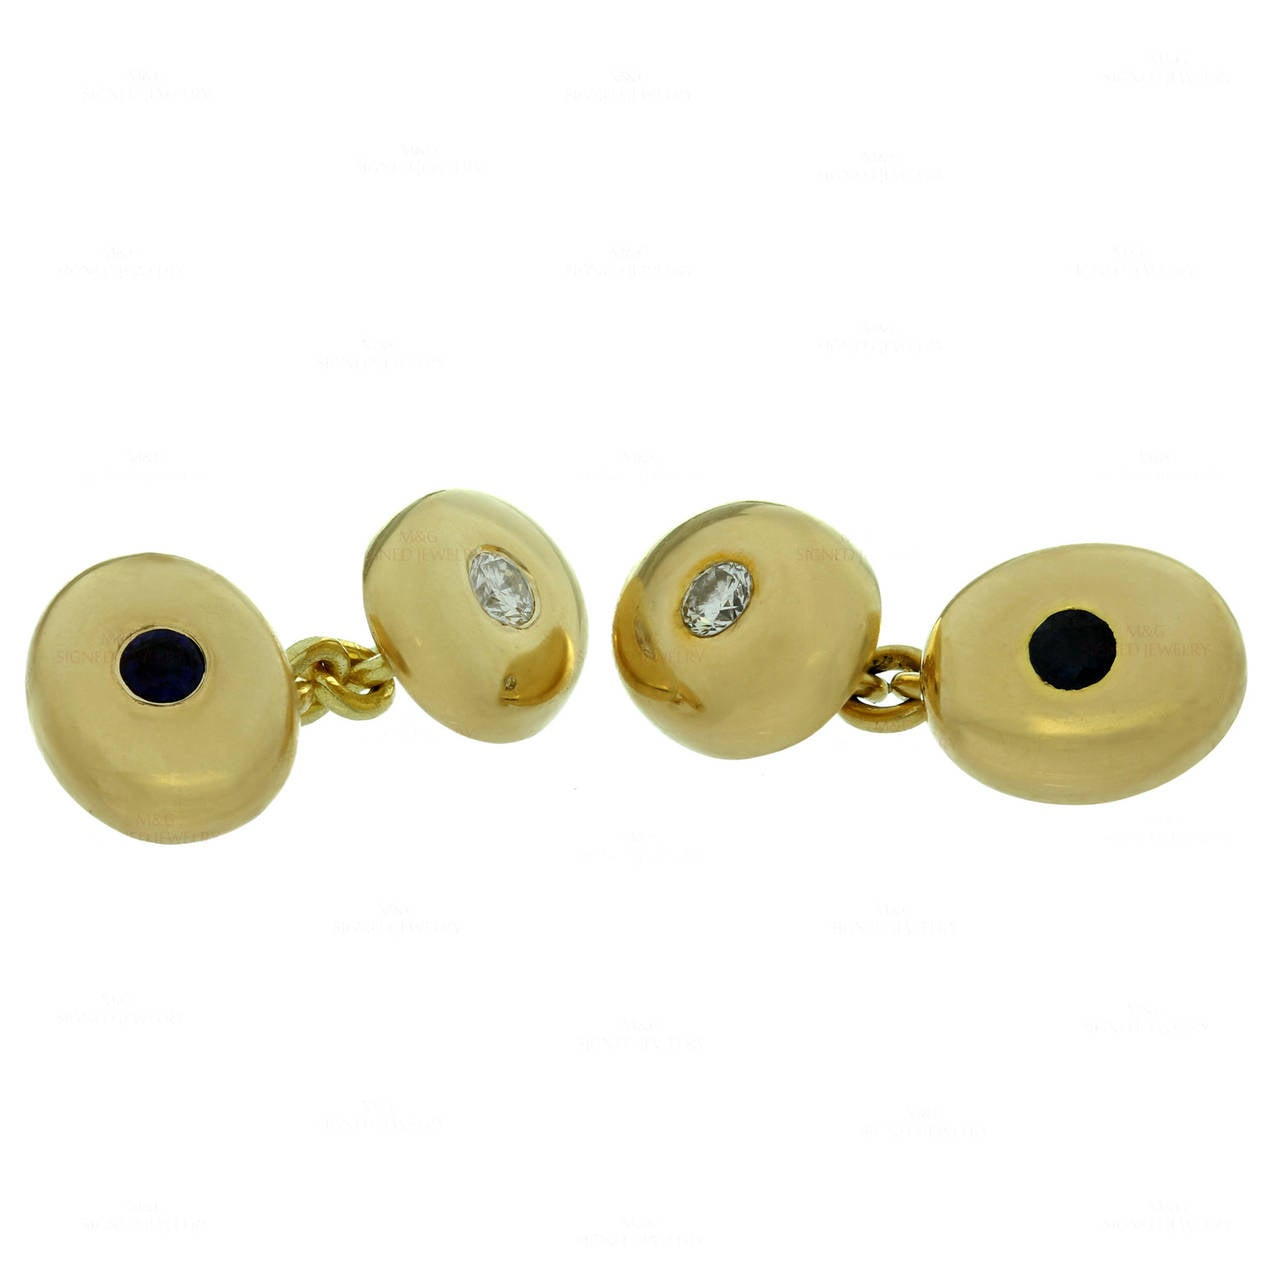 1950s Chaumet Paris Diamond Sapphire Yellow Gold Cufflinks